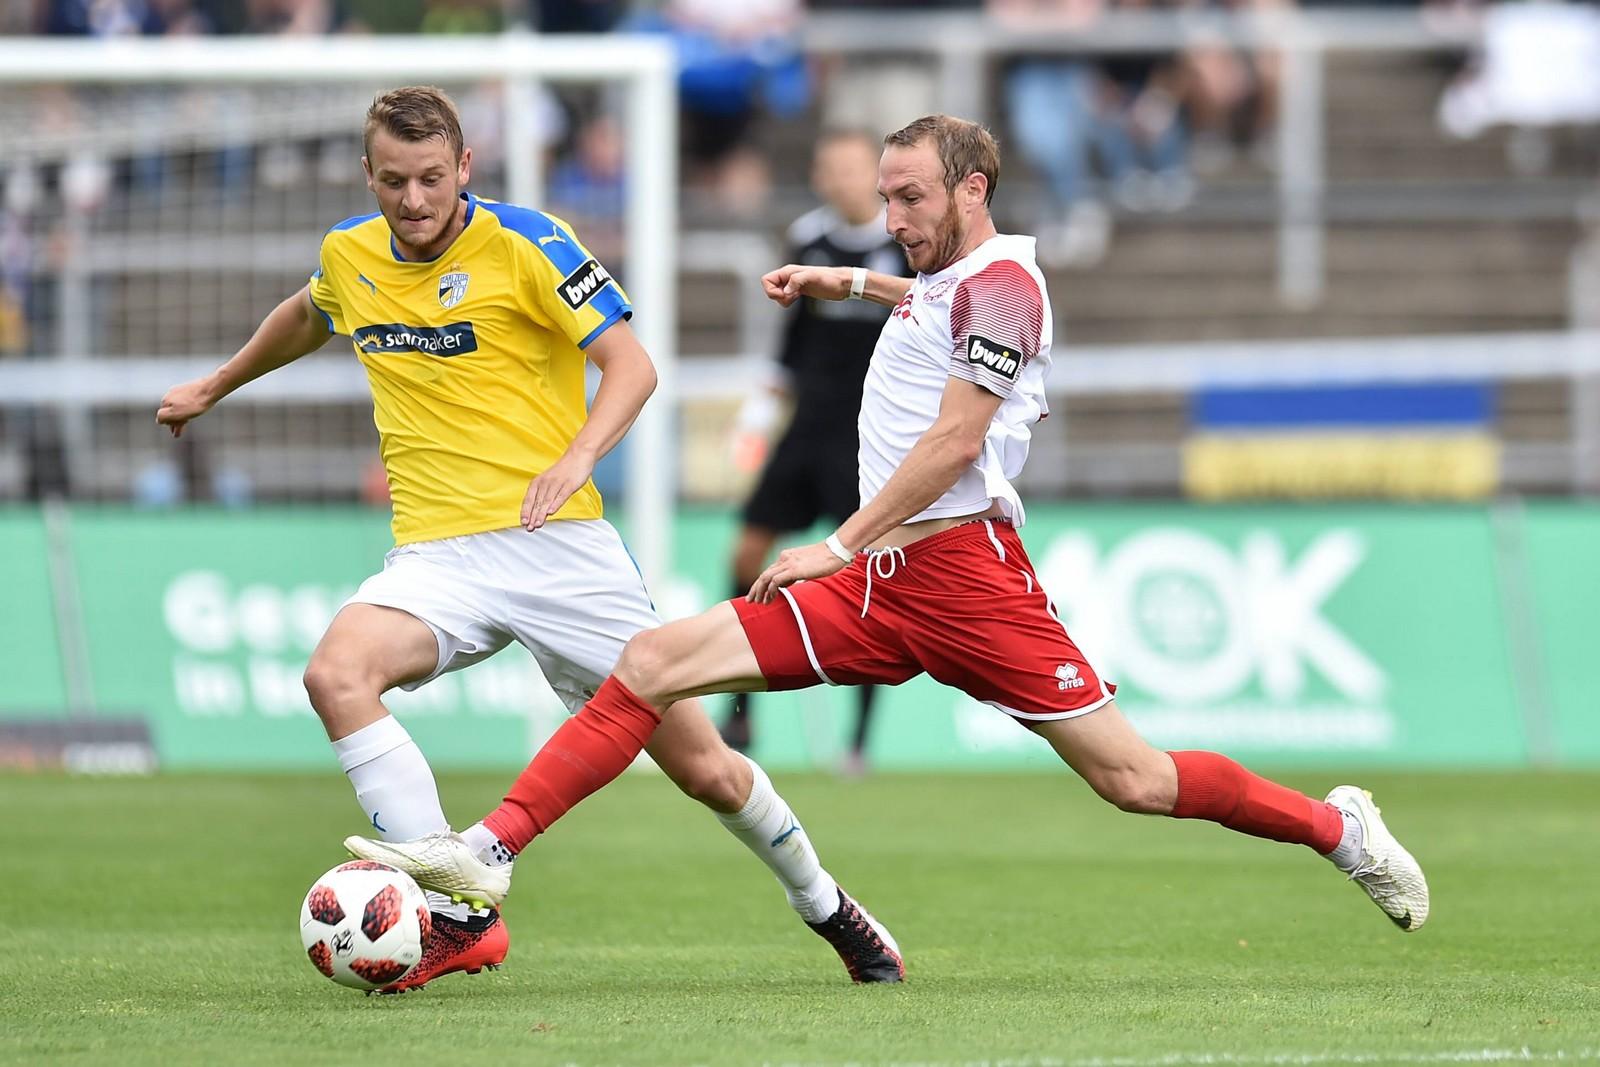 Moritz Hartmann (r.) ist vor Marius Grösch am Ball.